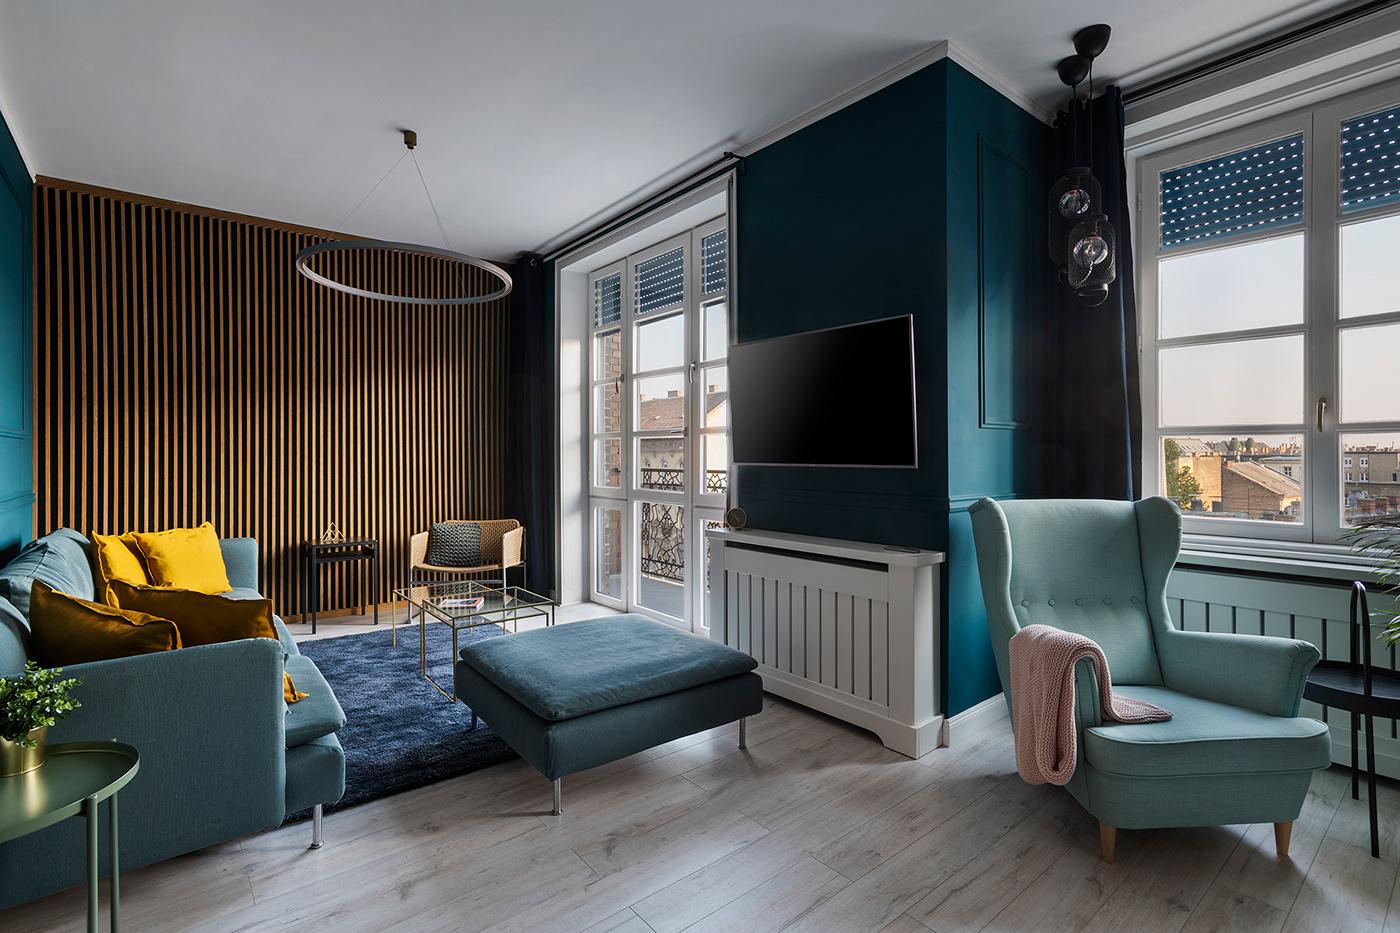 budapest Interior gasparbonta midcentury modern renovation wood brick teal